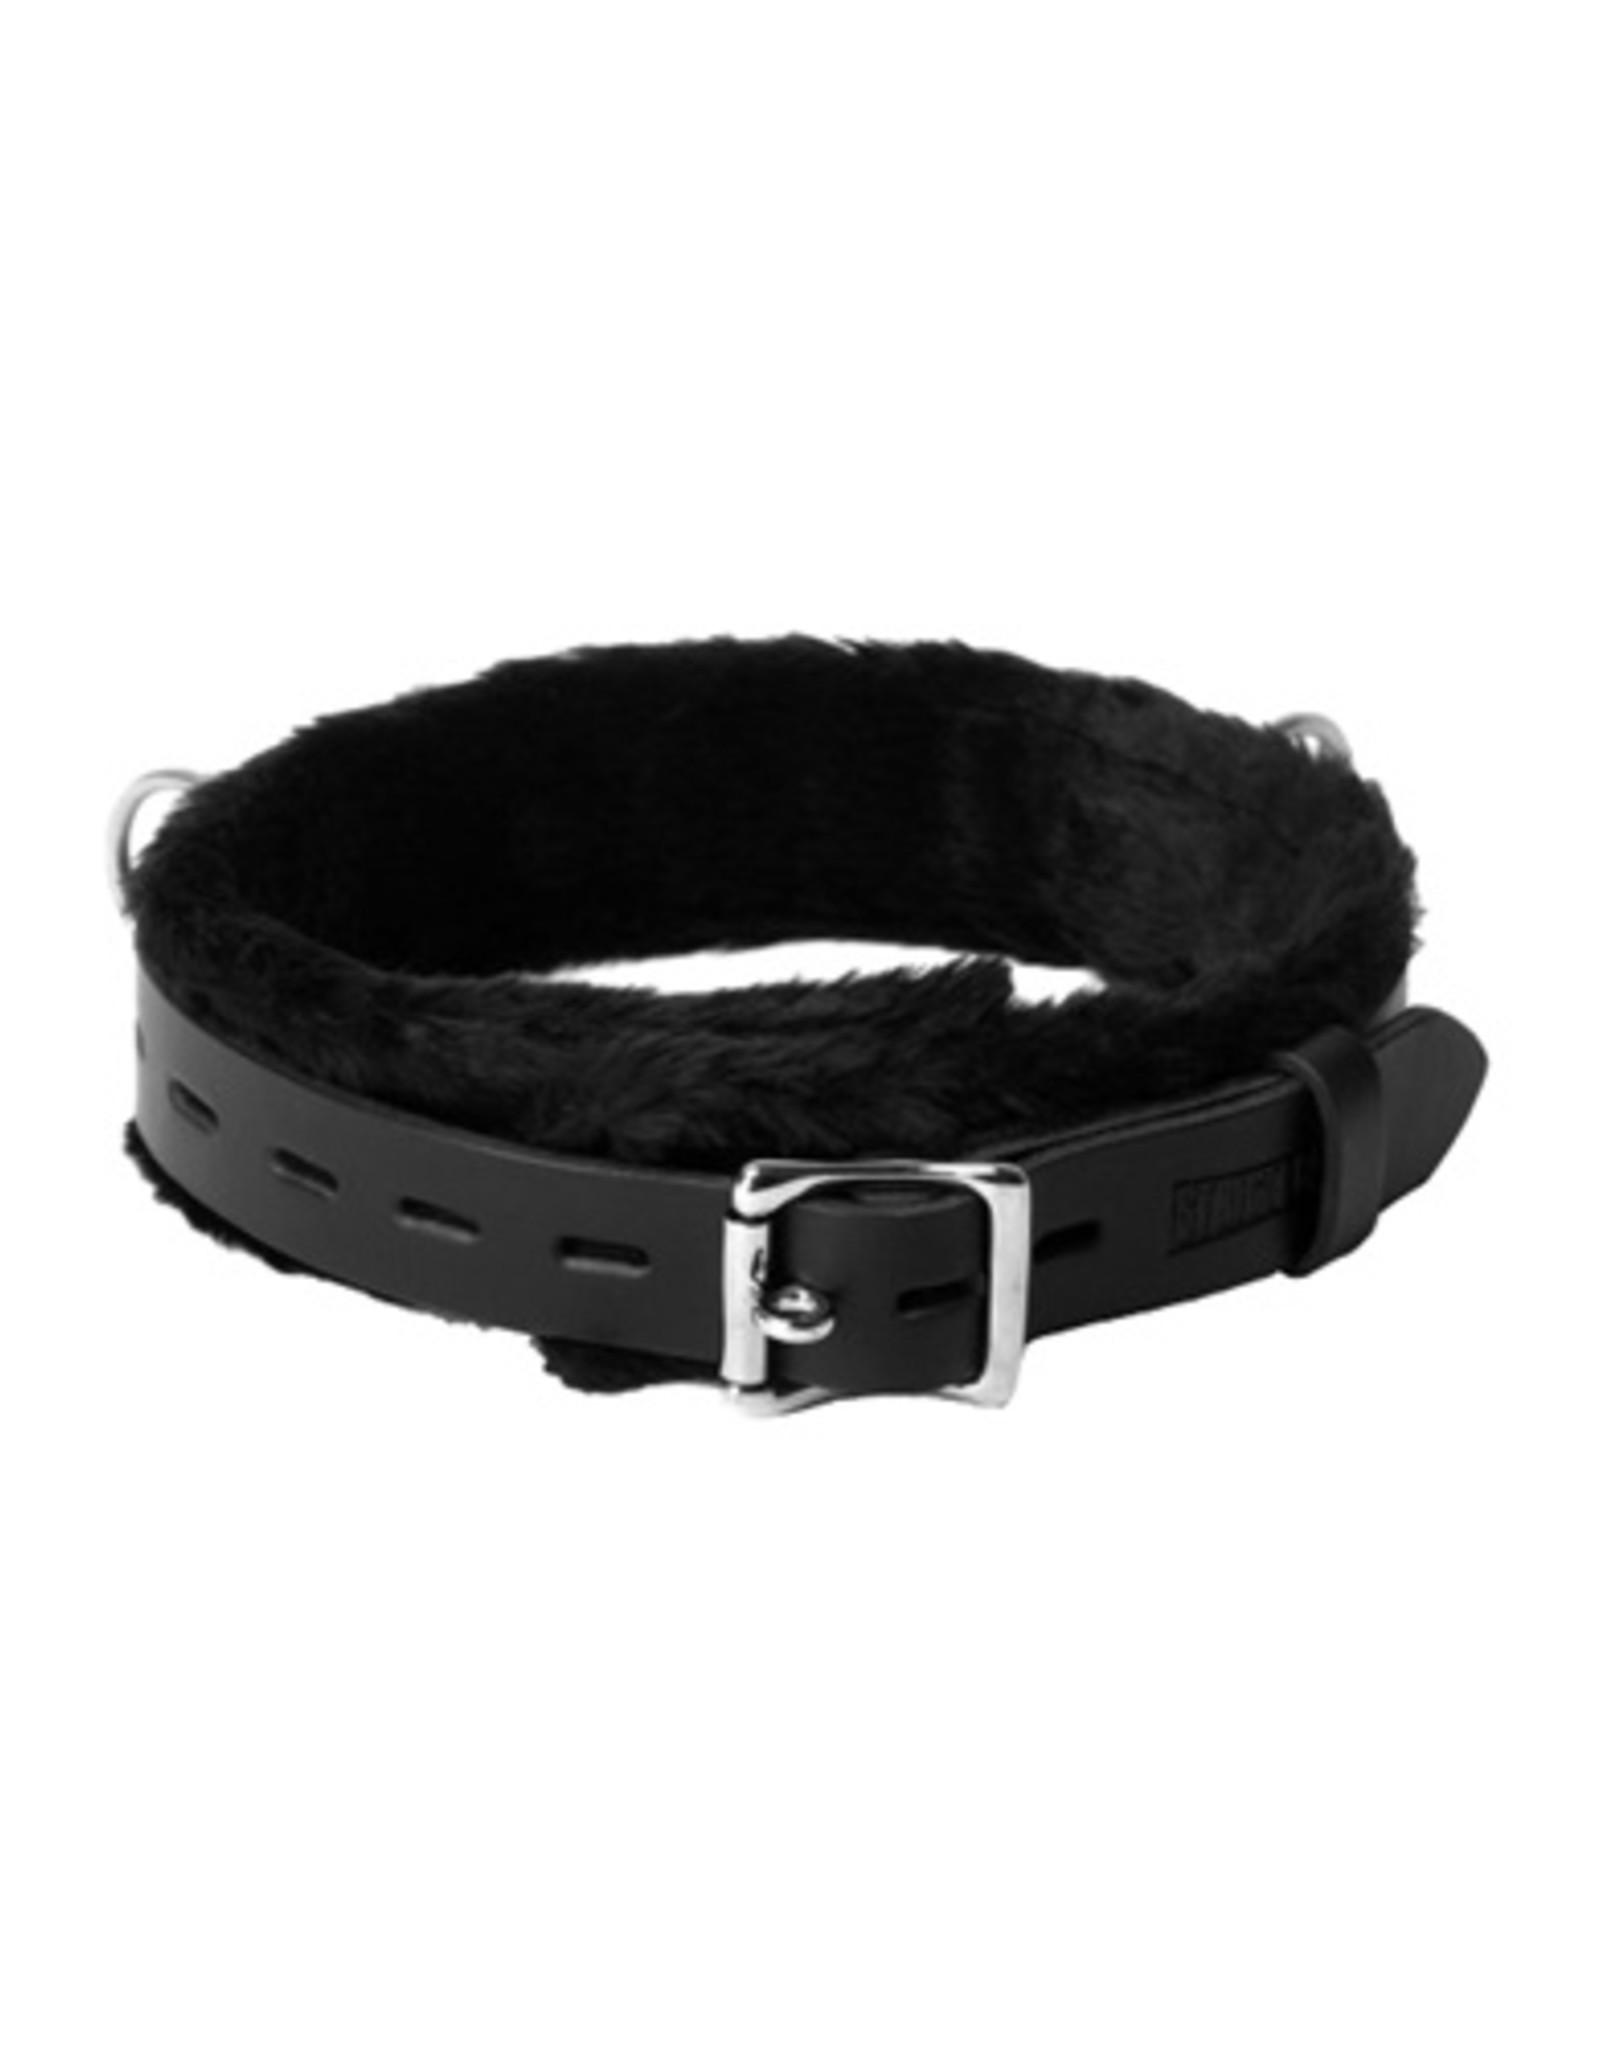 Strict Leather Leren Gevoerde Halsband